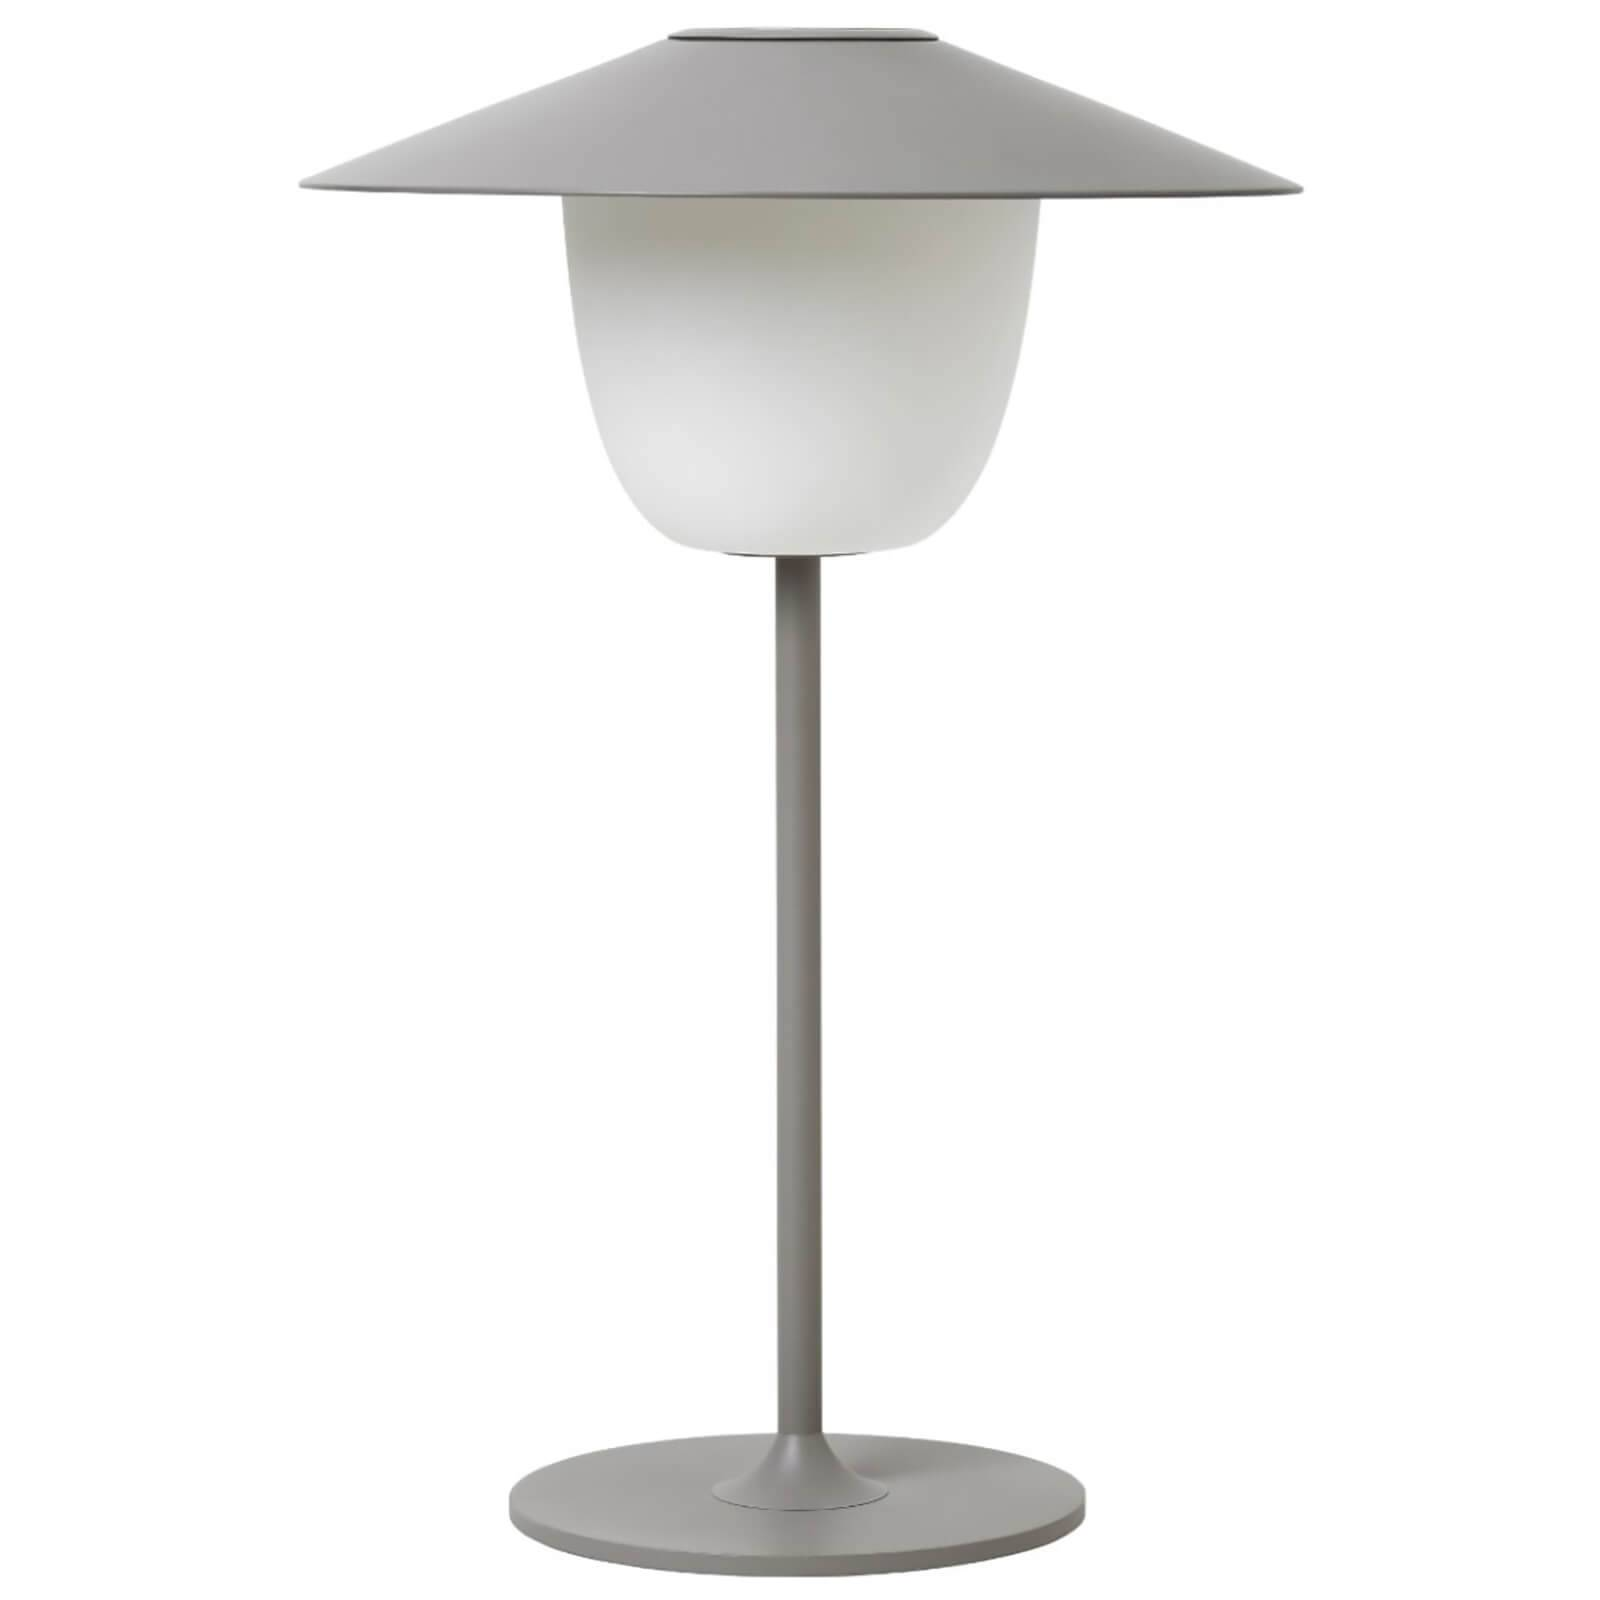 Blomus Ani Lamp Mobile LED - Lamp - Satellite